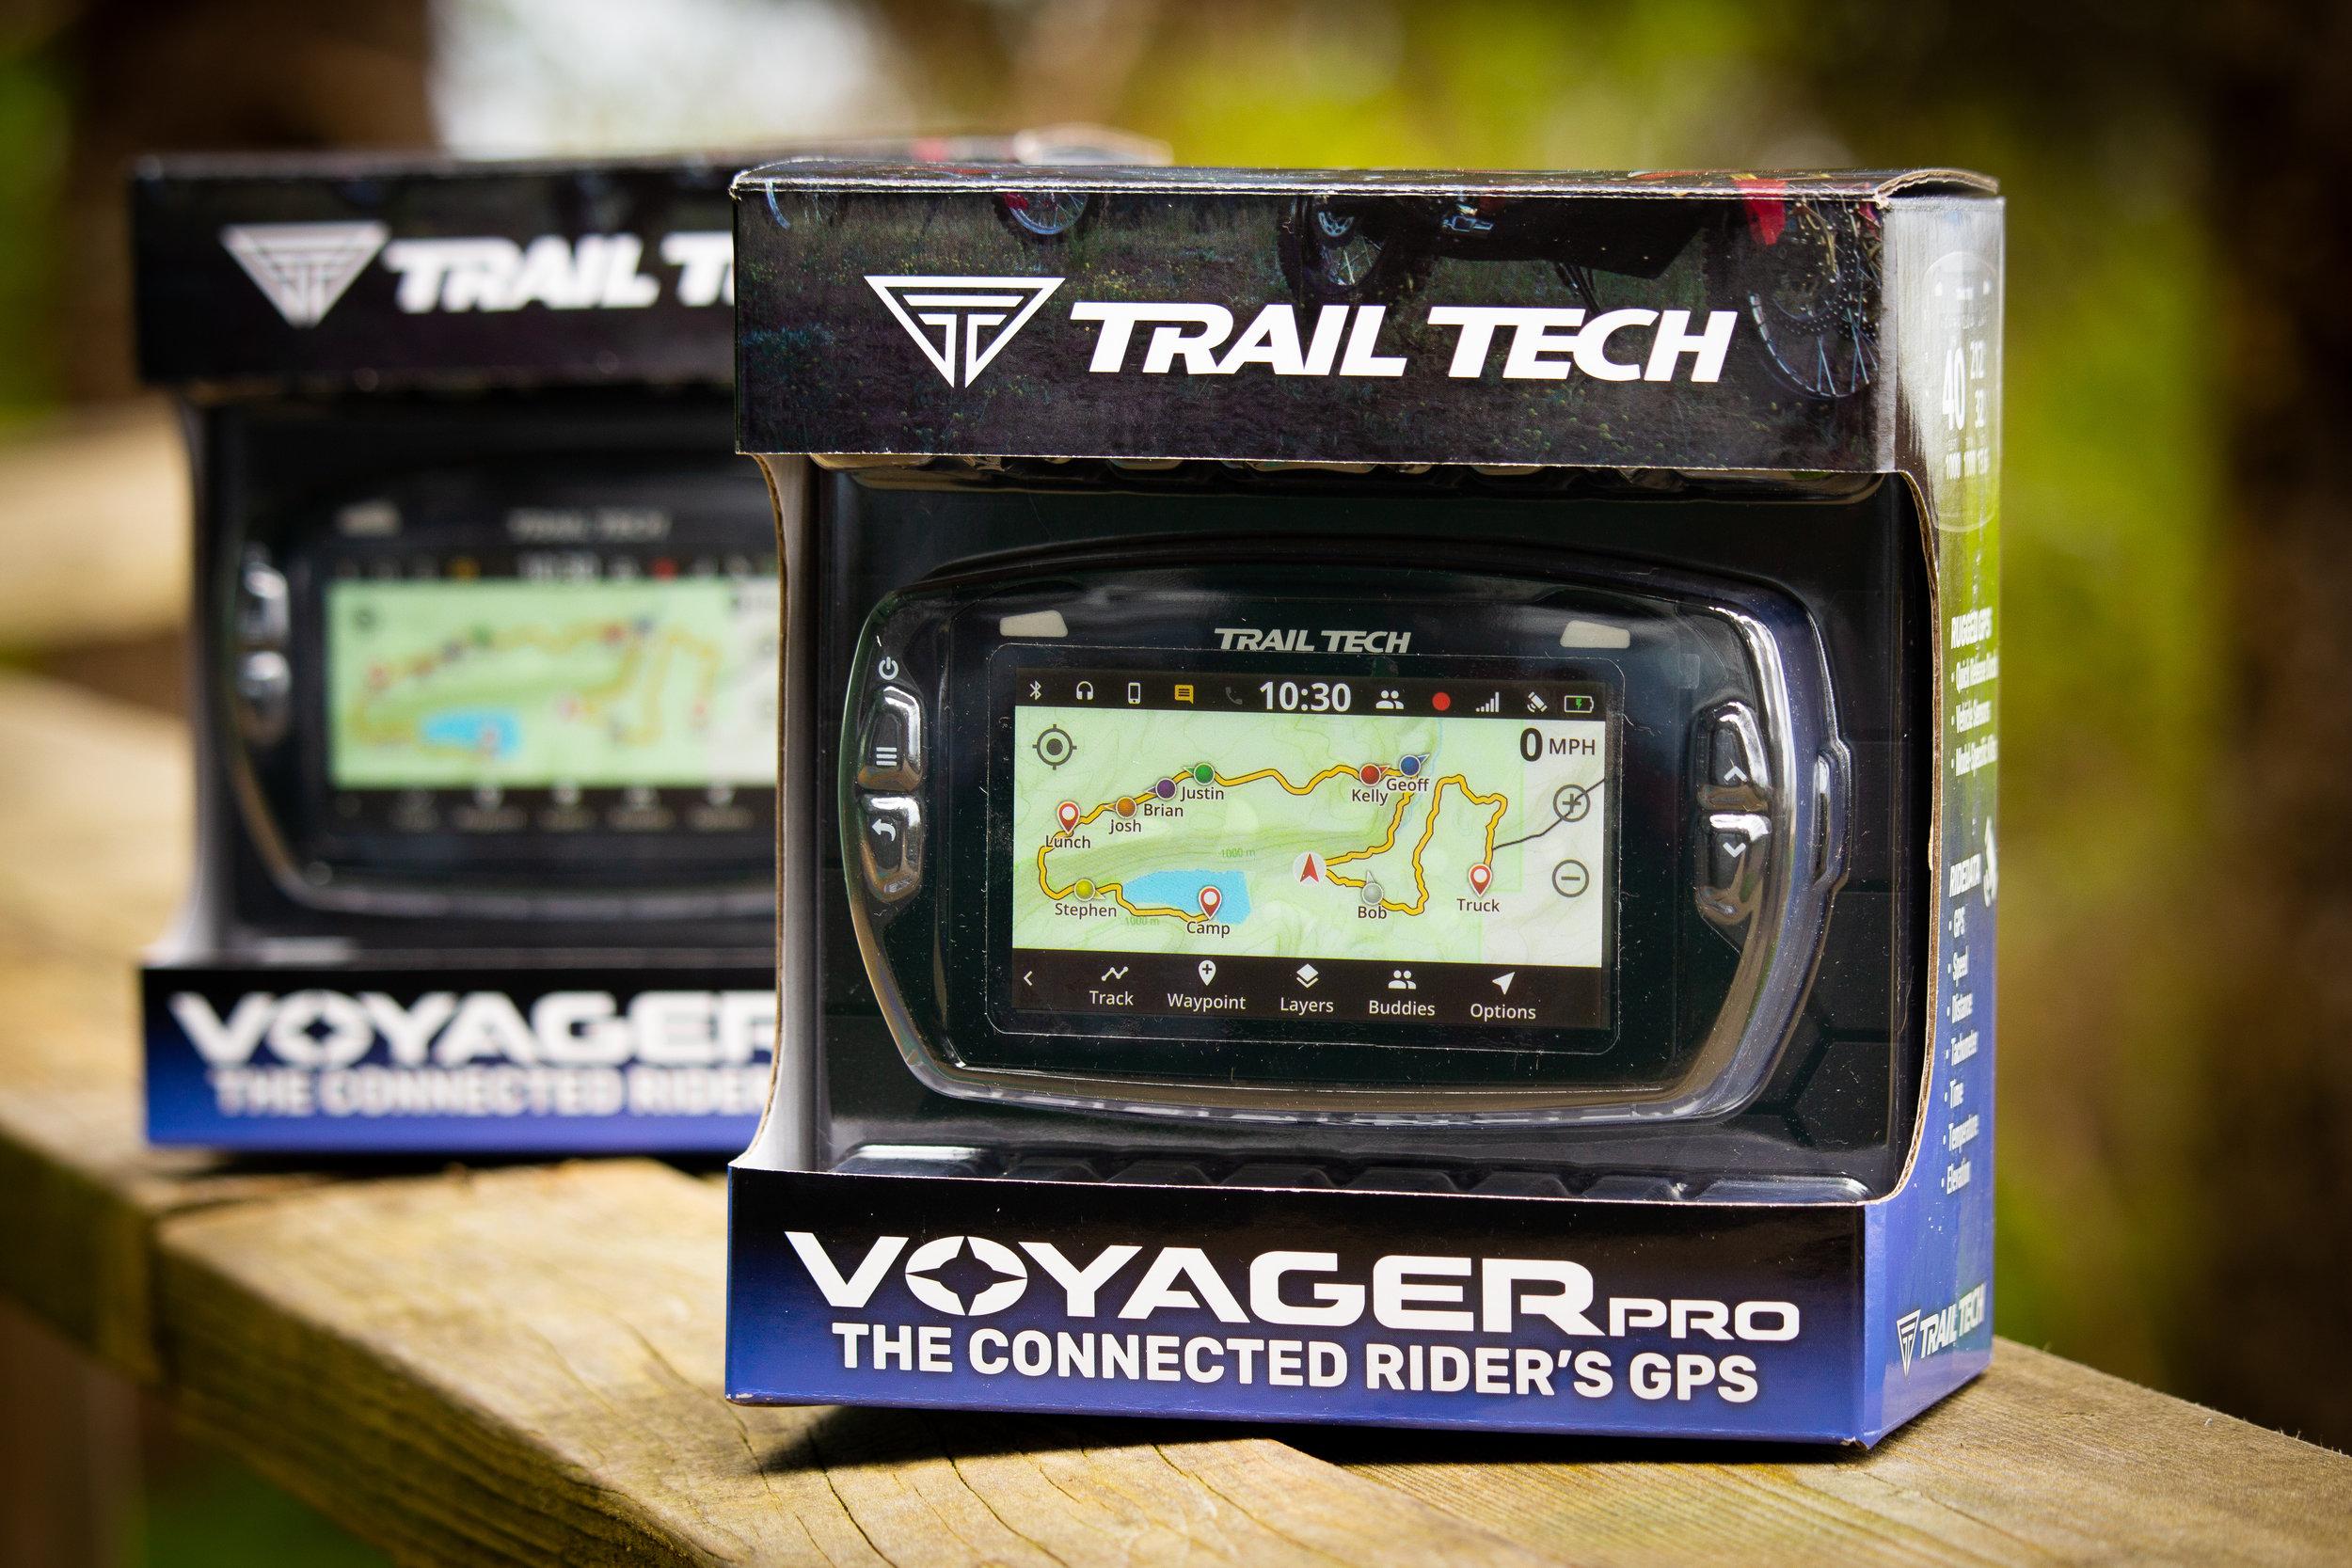 Adventure_Rider_Radio-Trail_Tech-Voyager_pro-4.jpg